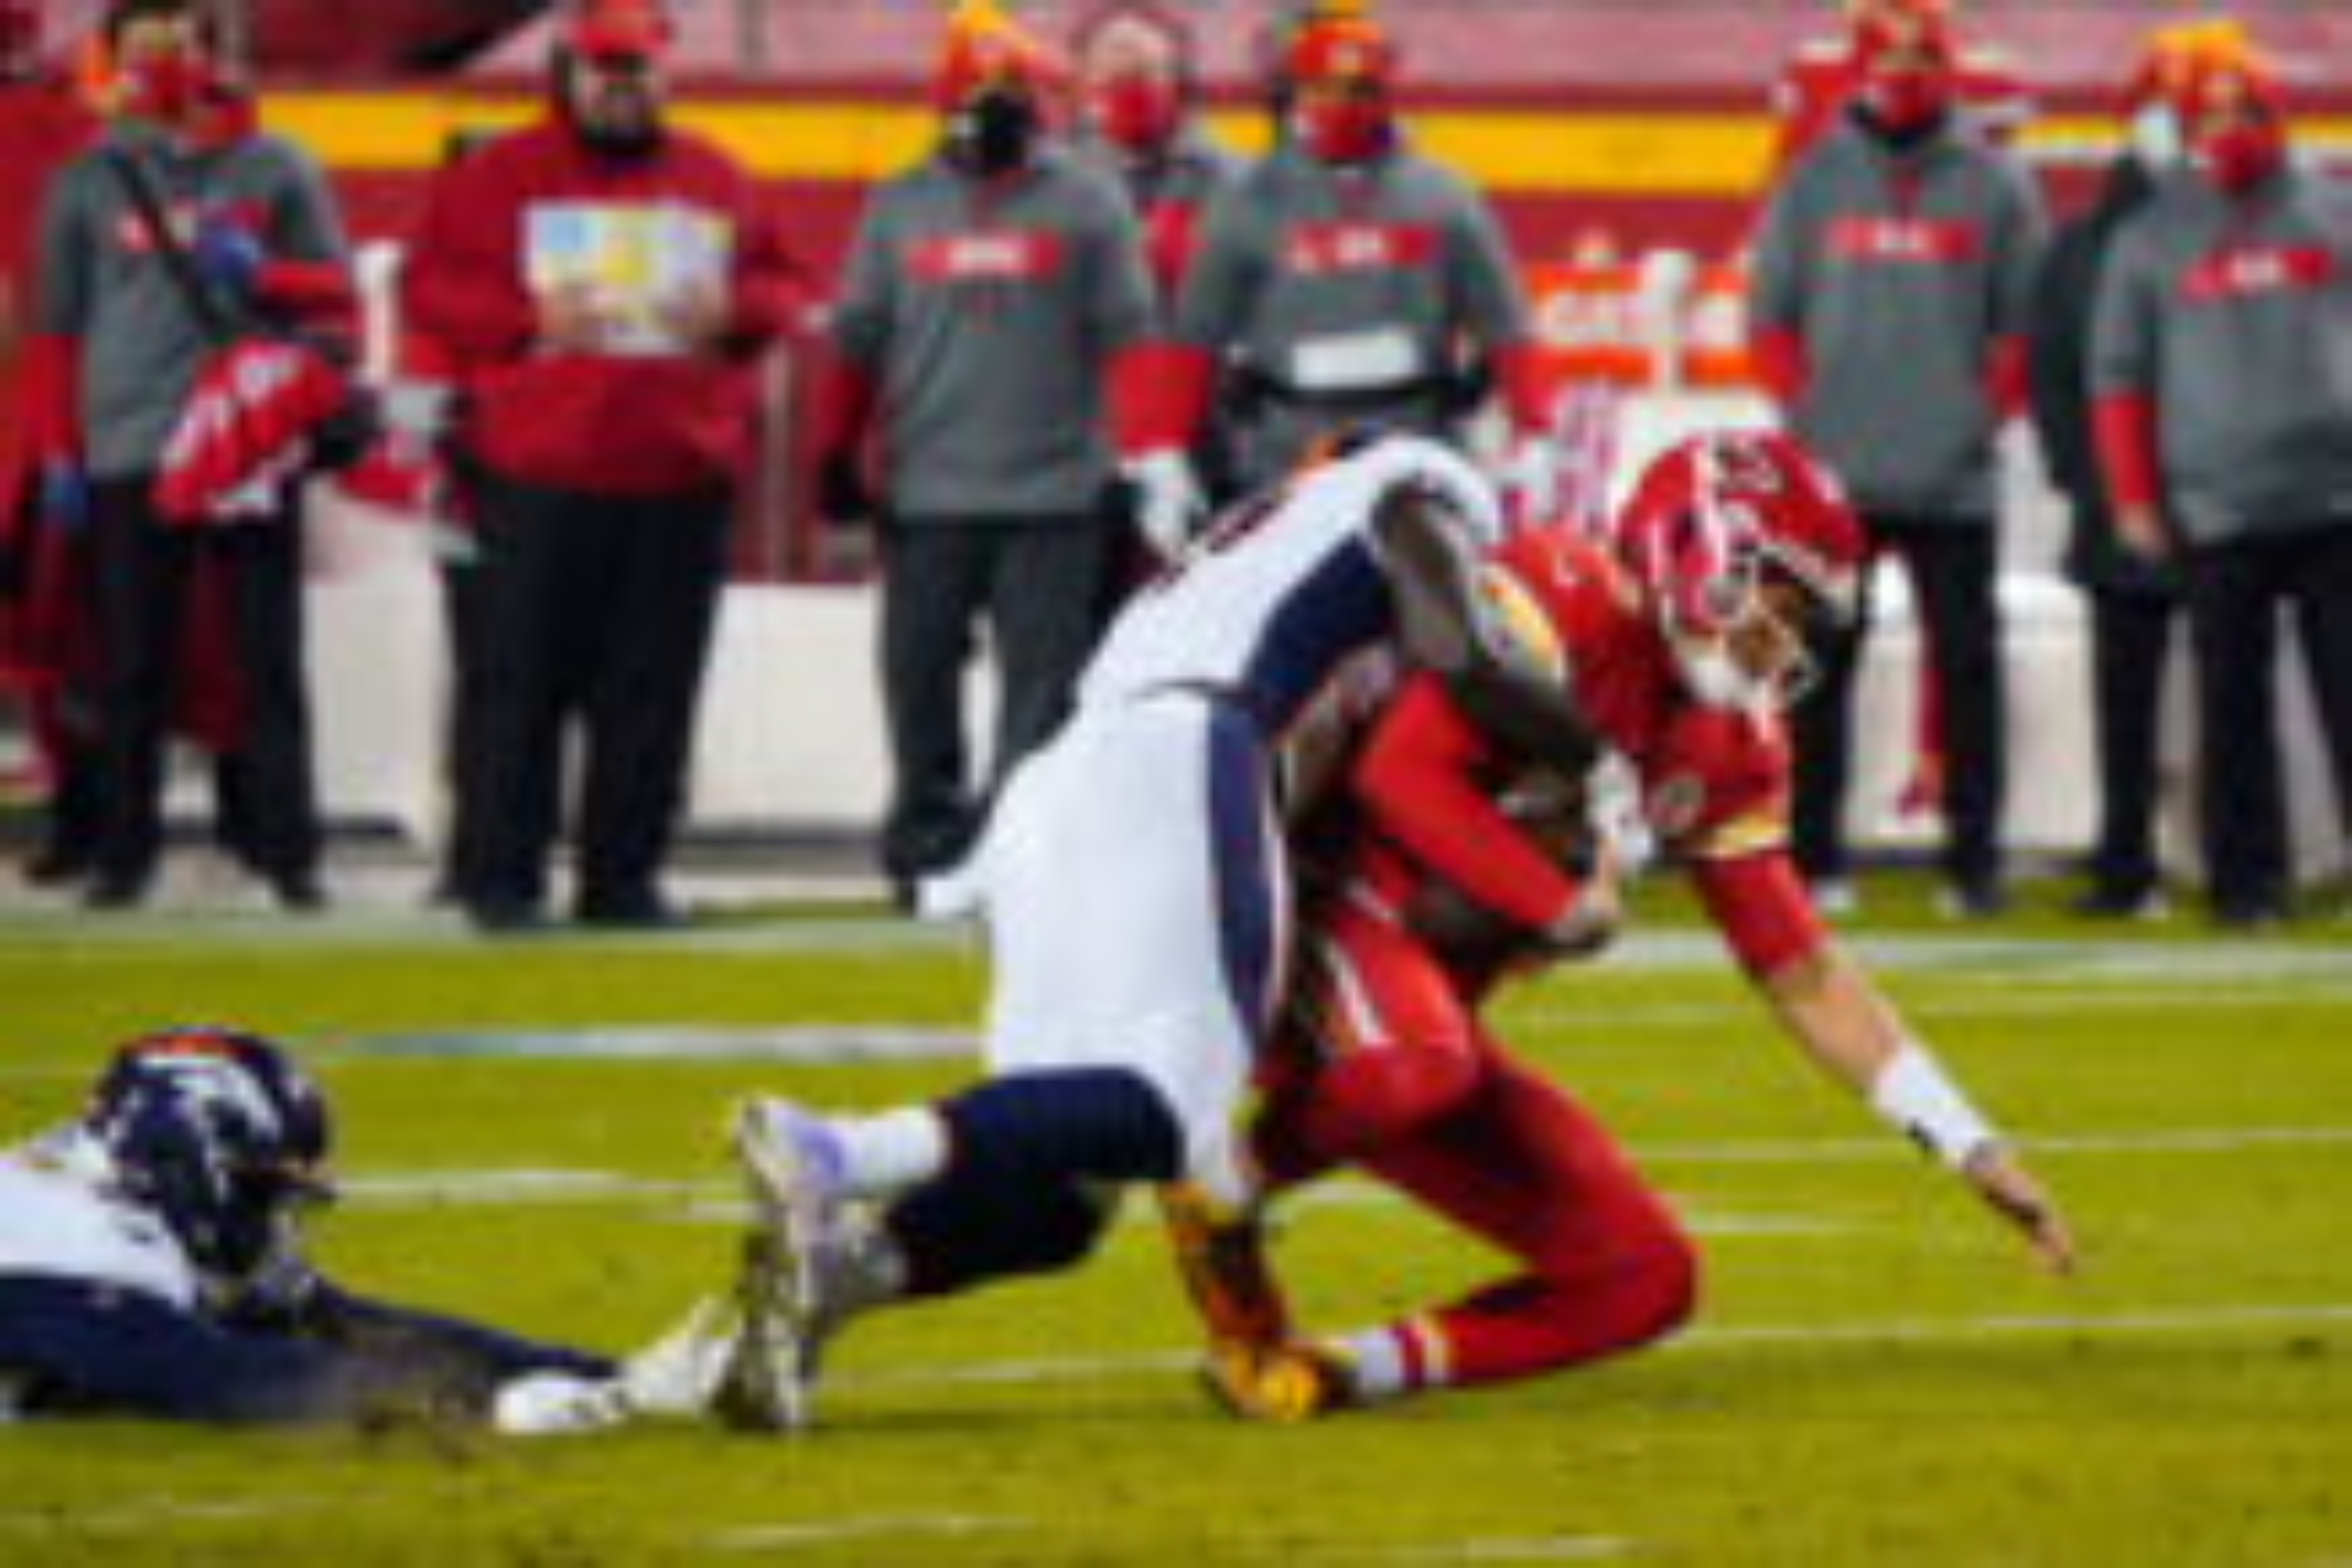 Denver Broncos outside linebacker Jeremiah Attaochu (C) sacks Kansas City Chiefs quarterback Patrick Mahomes (R) during the second half at Arrowhead Stadium.